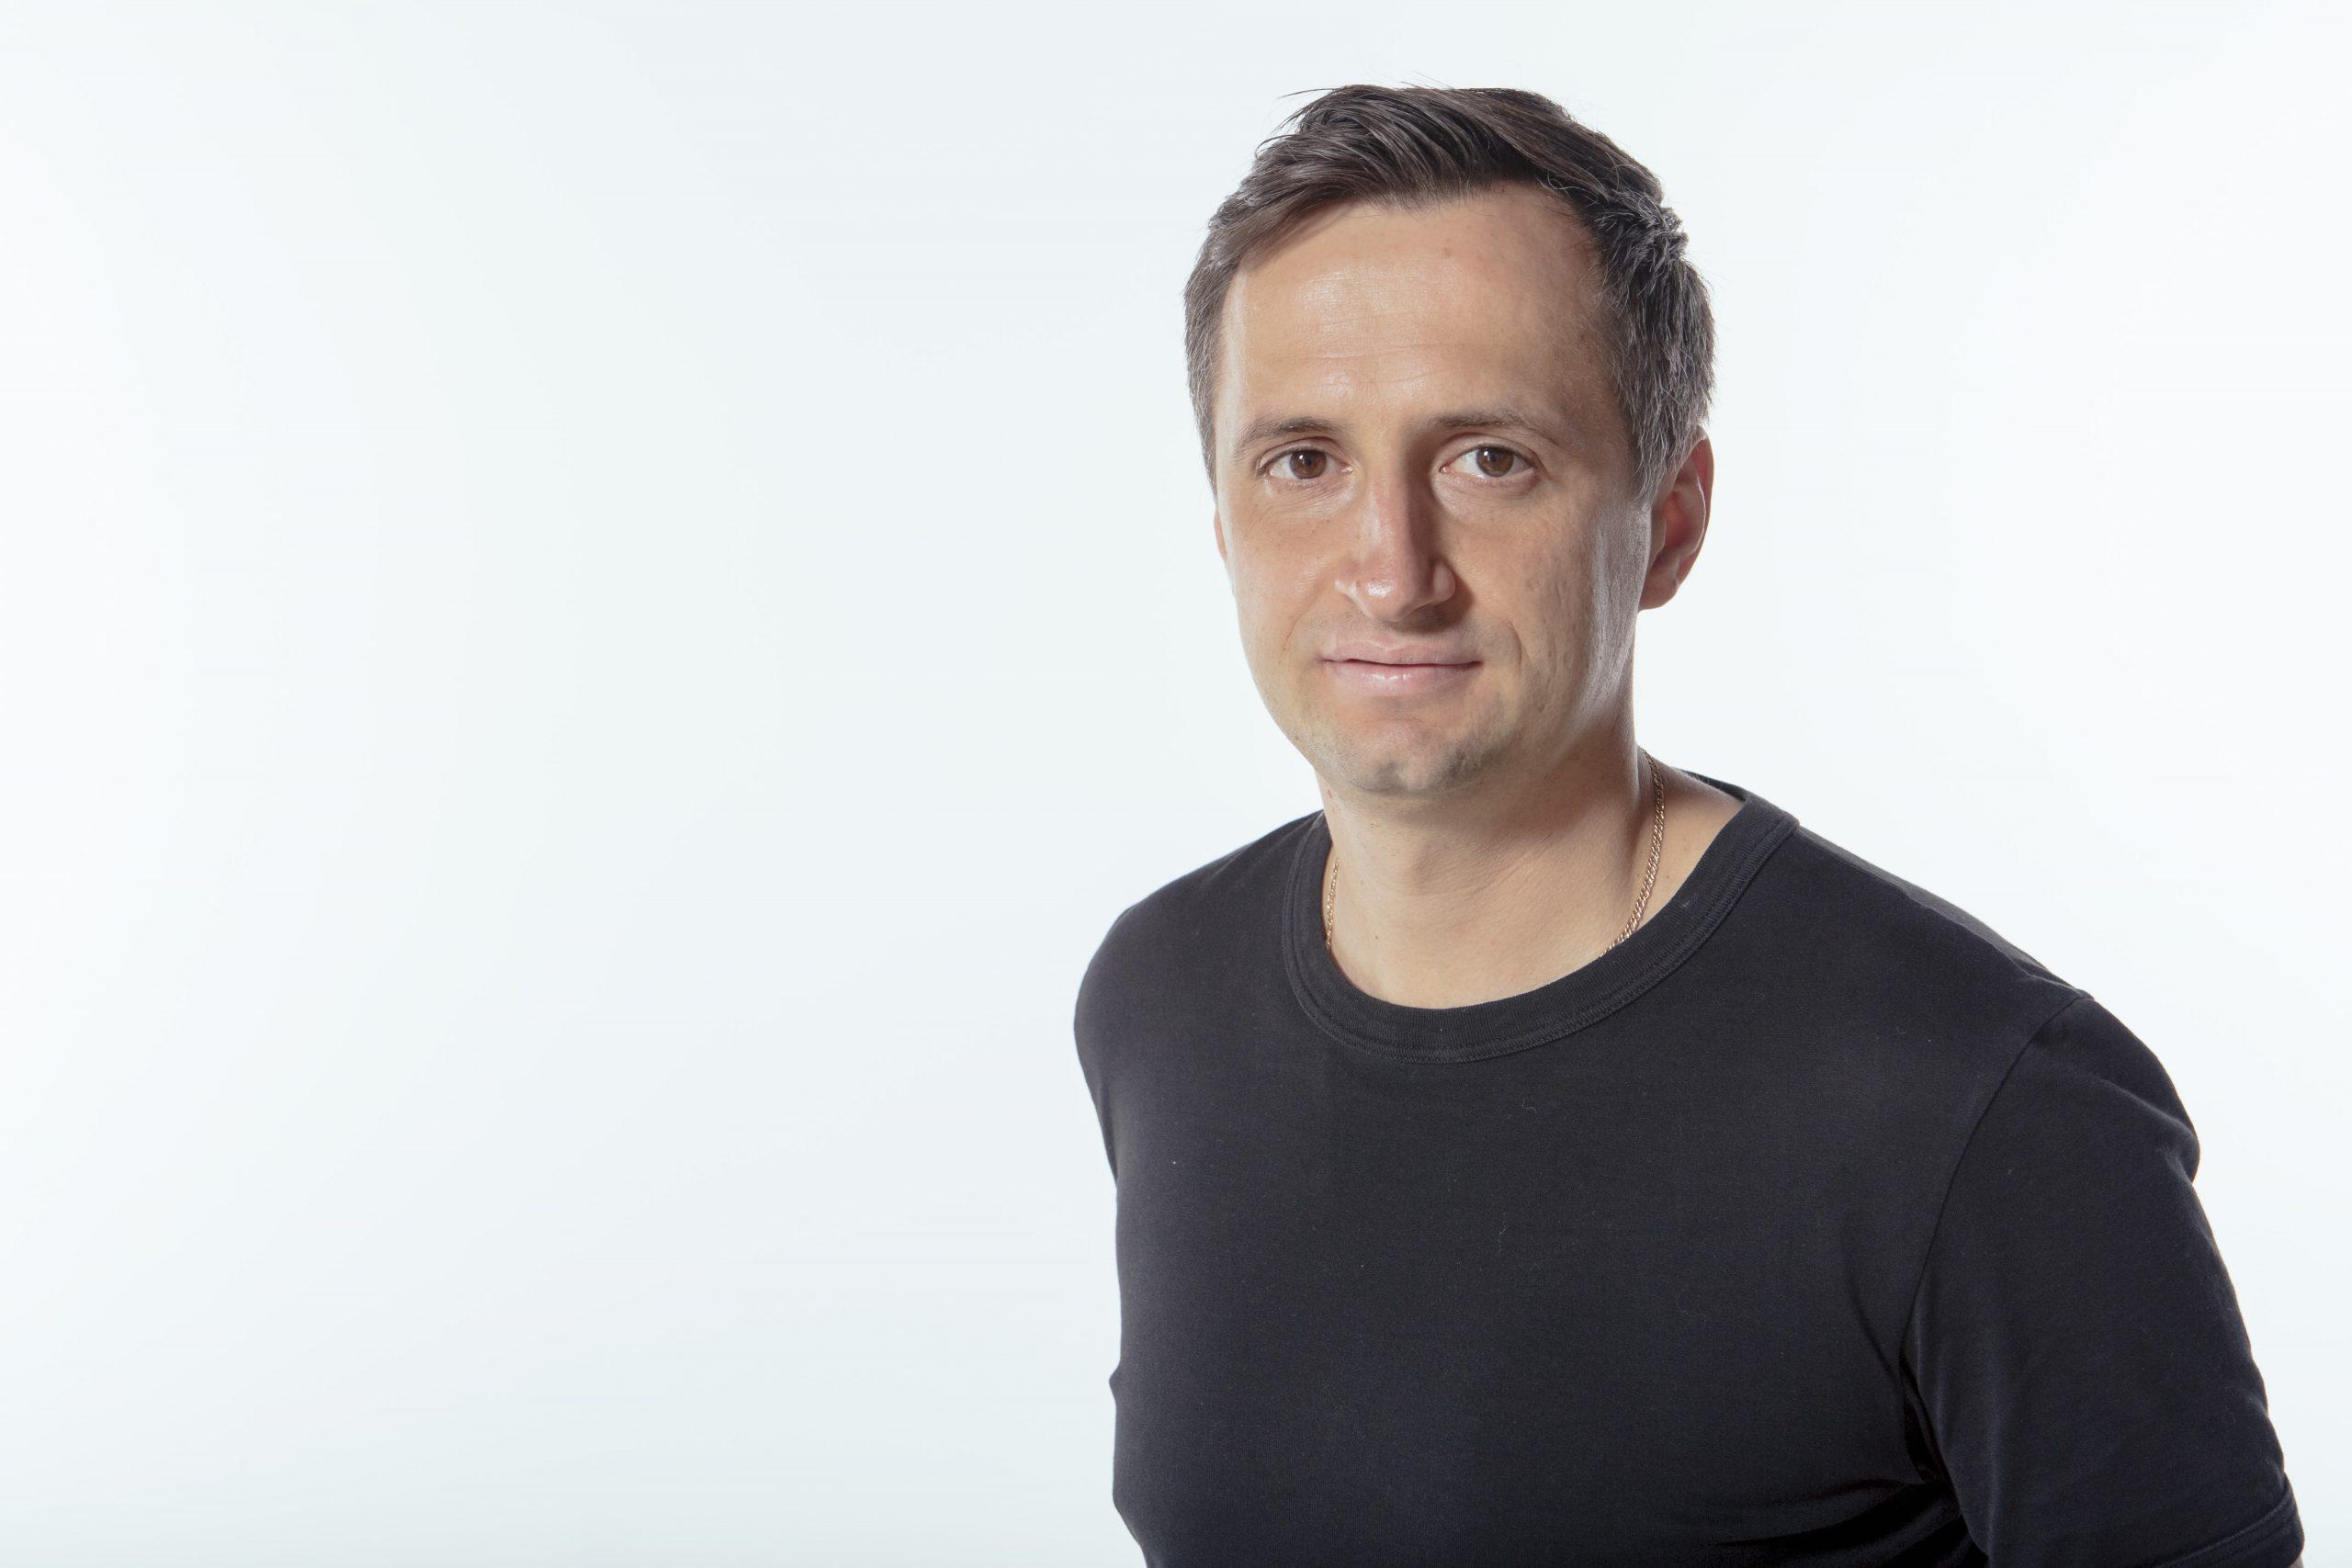 Digital-Marketing-Expert-Denis-Lagutenko-Unveils-Interactive-Content-Marketing-Formats-That-Work-in-2021-1-scaled.jpg